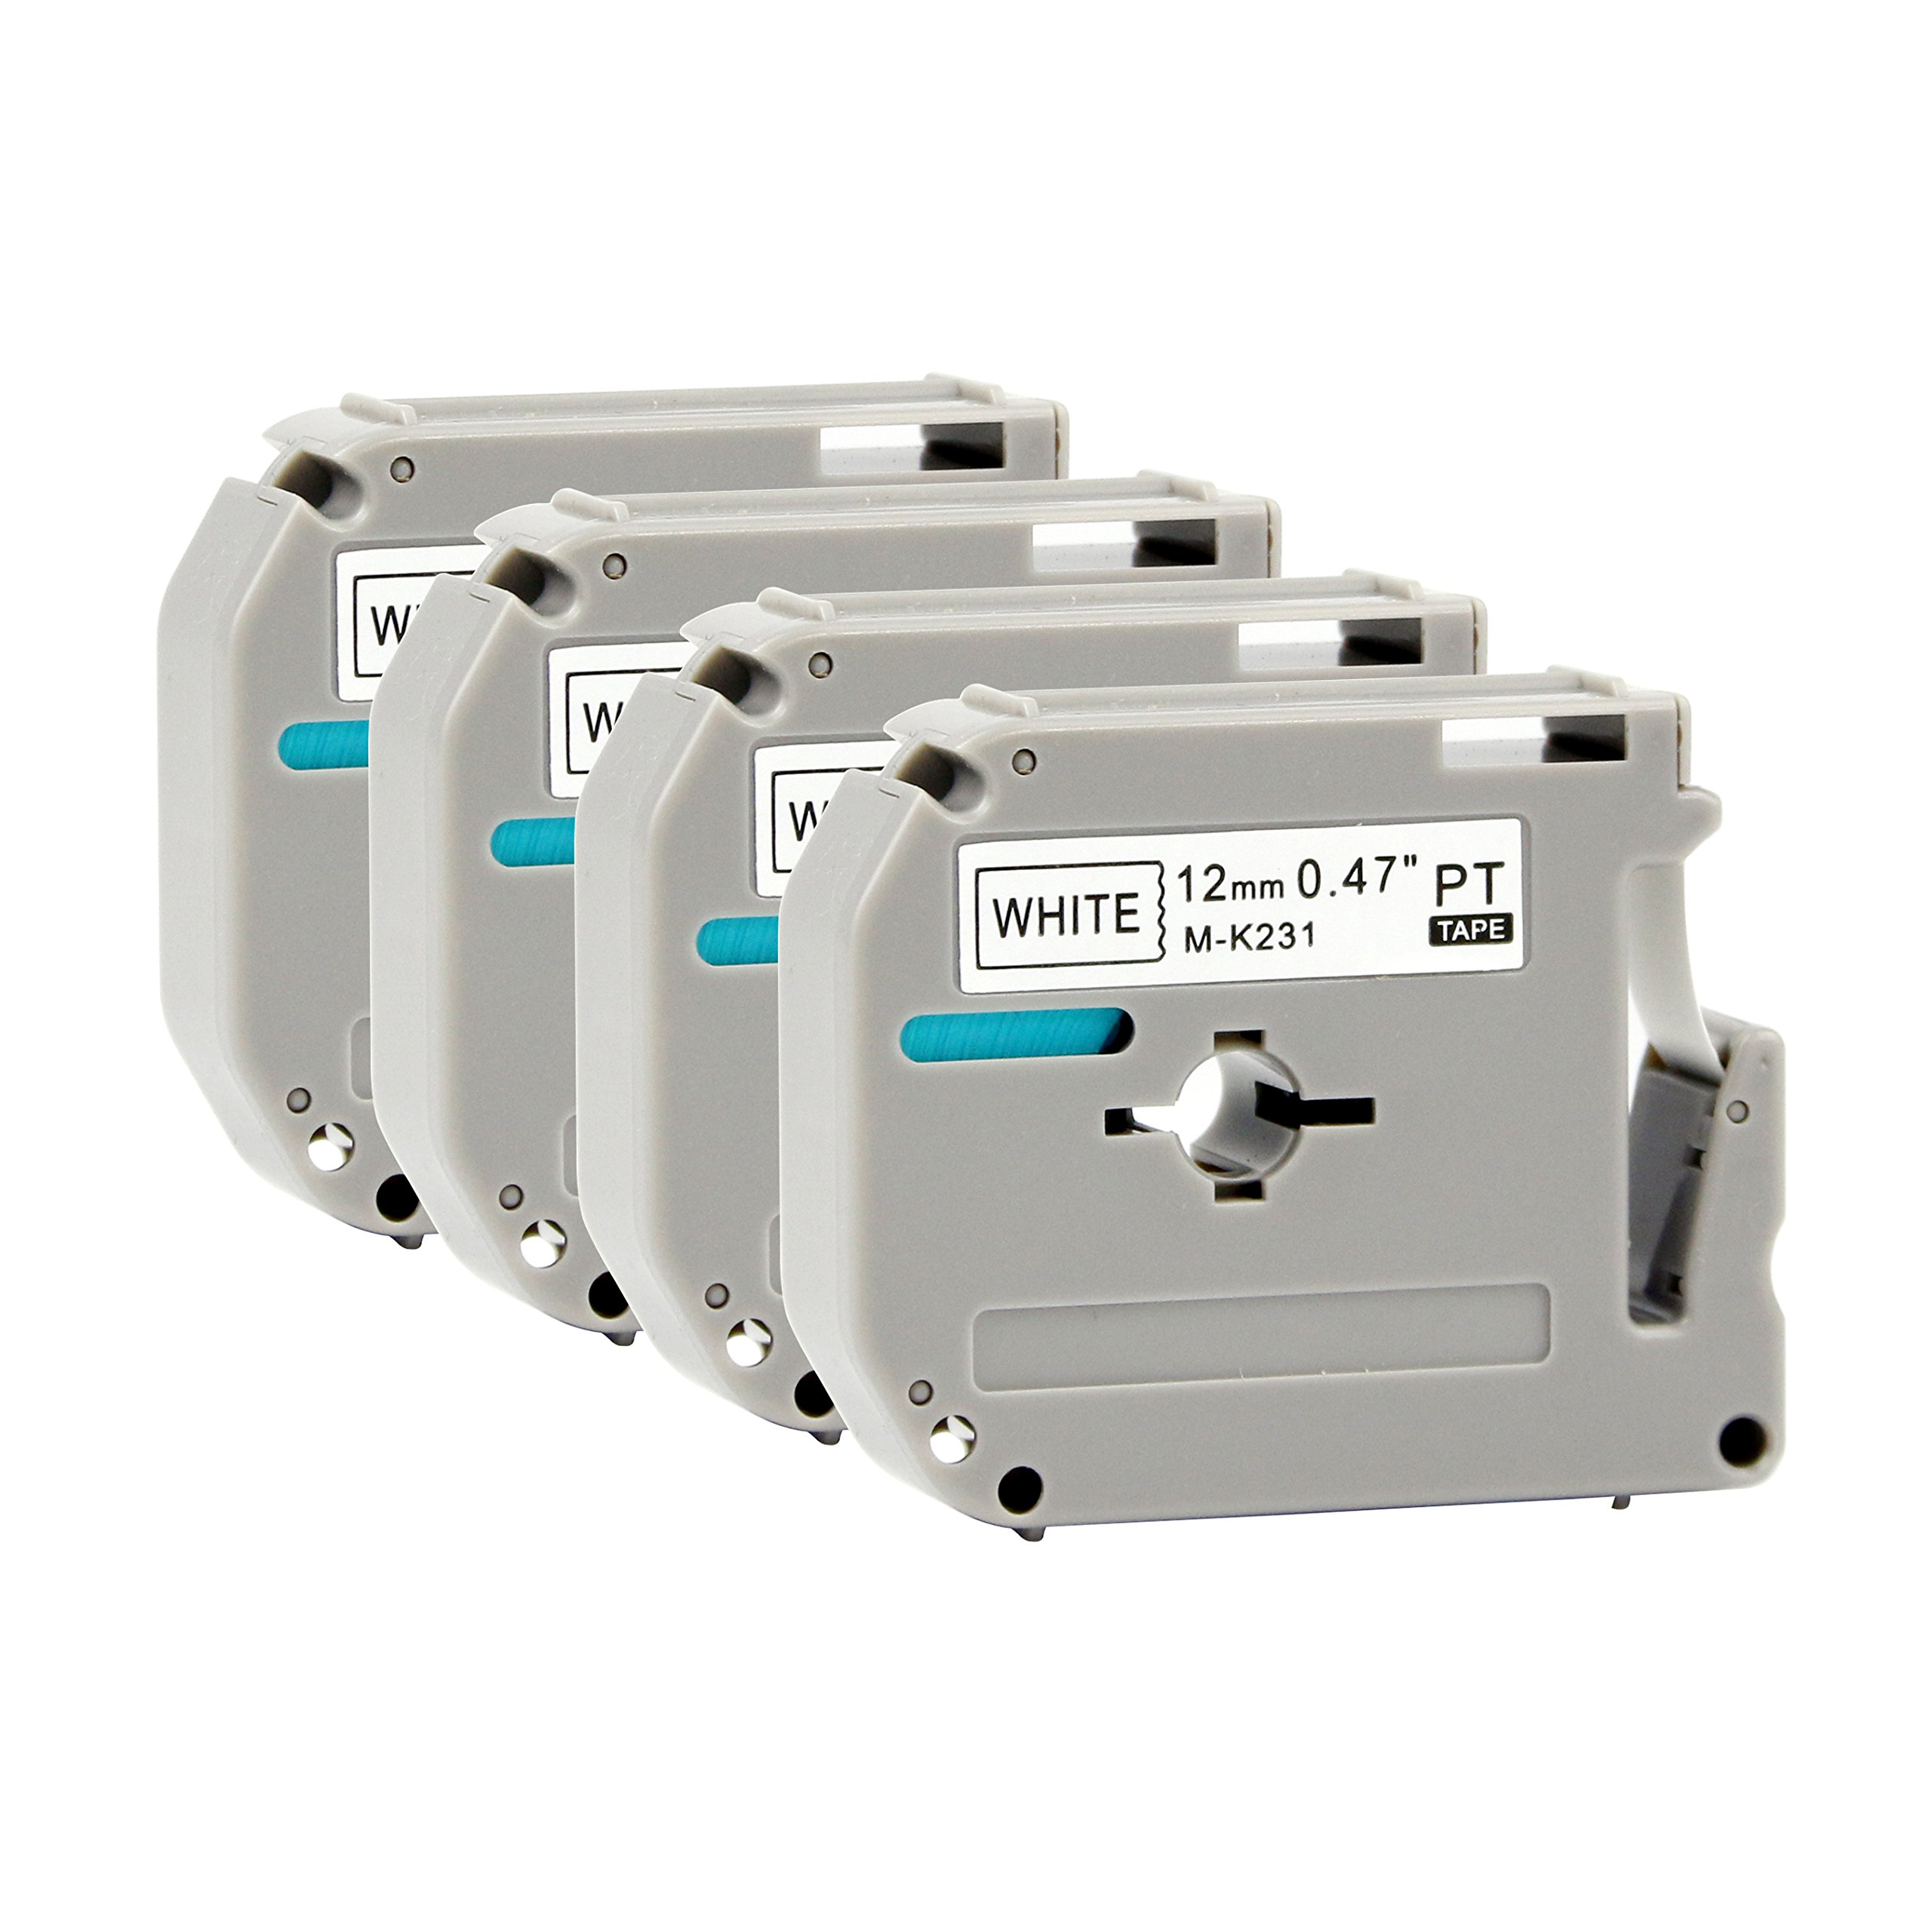 M231 MK231 M-K231 Label Tape Cartridge M Tape,Use on Brother P-Touch PT-90 PT-M95 PTM95M PT-70SR PT-80 PT-70BM PT-70 PT-55BM Label Maker, Black on White, 0.47 in x 26.2 ft/(12mm) X (8m),4-Pack